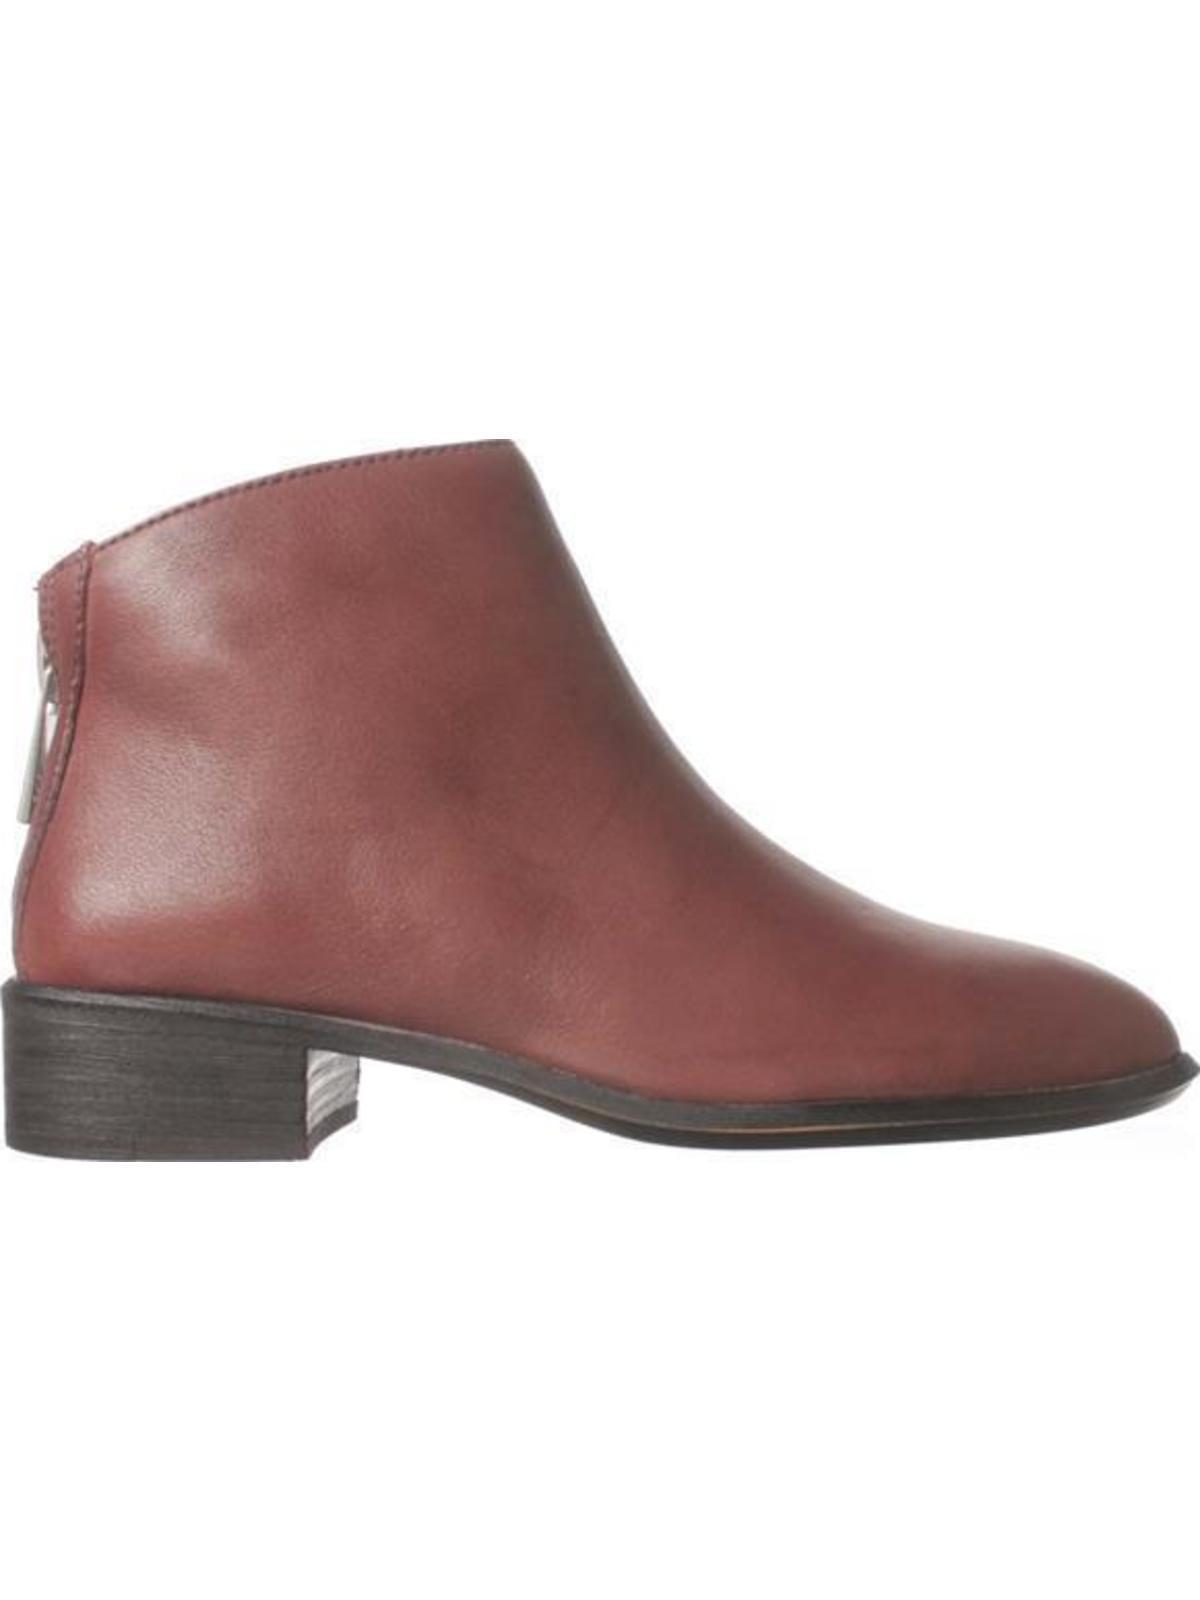 Womens Dolce Vita Mylene Chelsea Ankle Boots, Bordeaux, 9.5 US